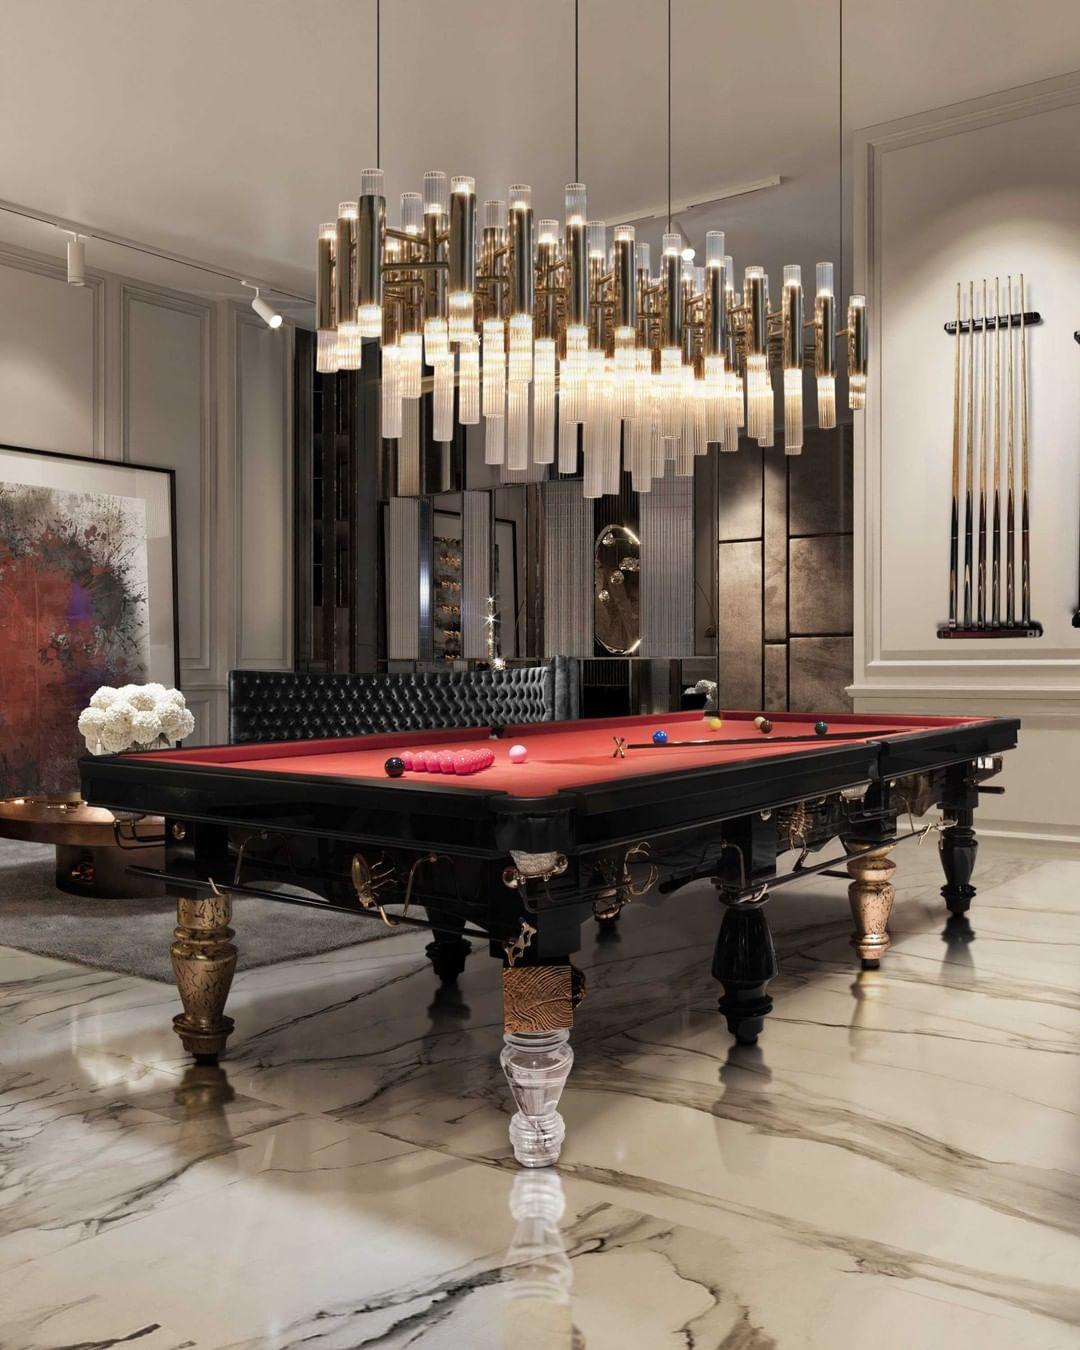 Entertainment Room Design - A Game Of Luxury And Sophistication entertainment room design Entertainment Room Design – A Game Of Luxury And Sophistication bocadolobostudio 213804700 174269714610915 7772926110176284273 n